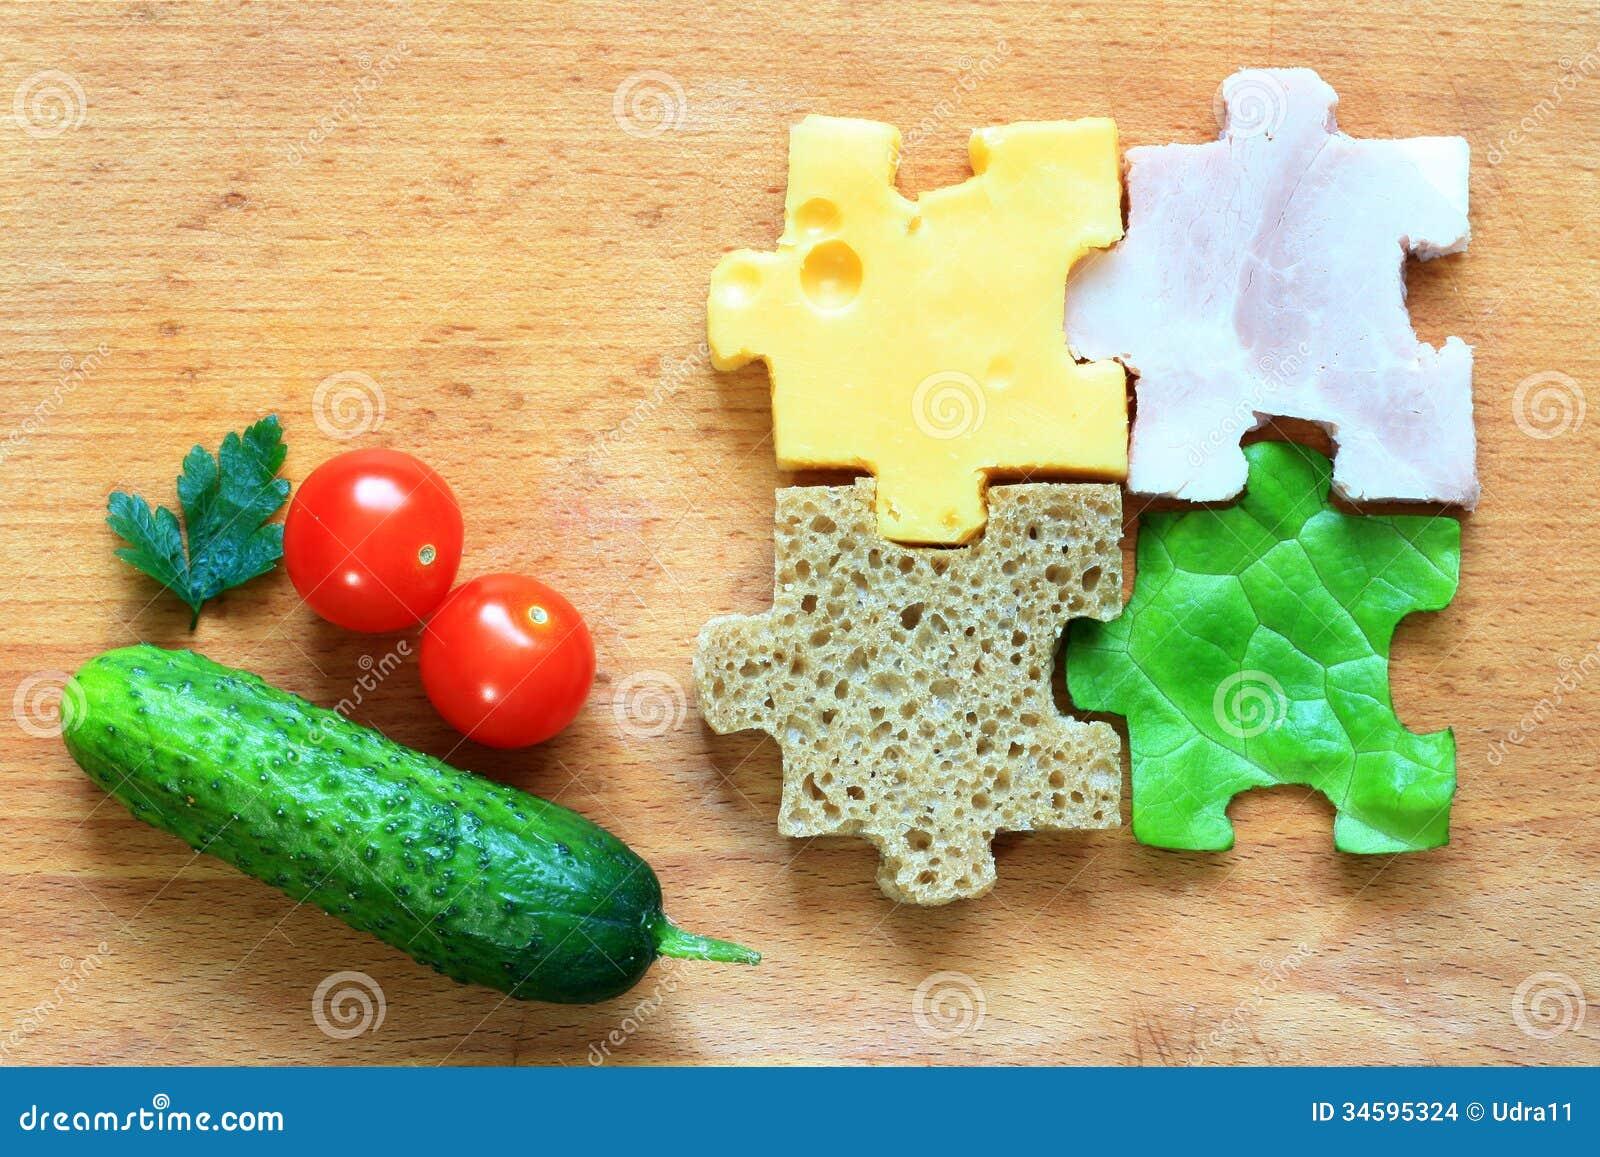 Food puzzle ingredients diet creative concept